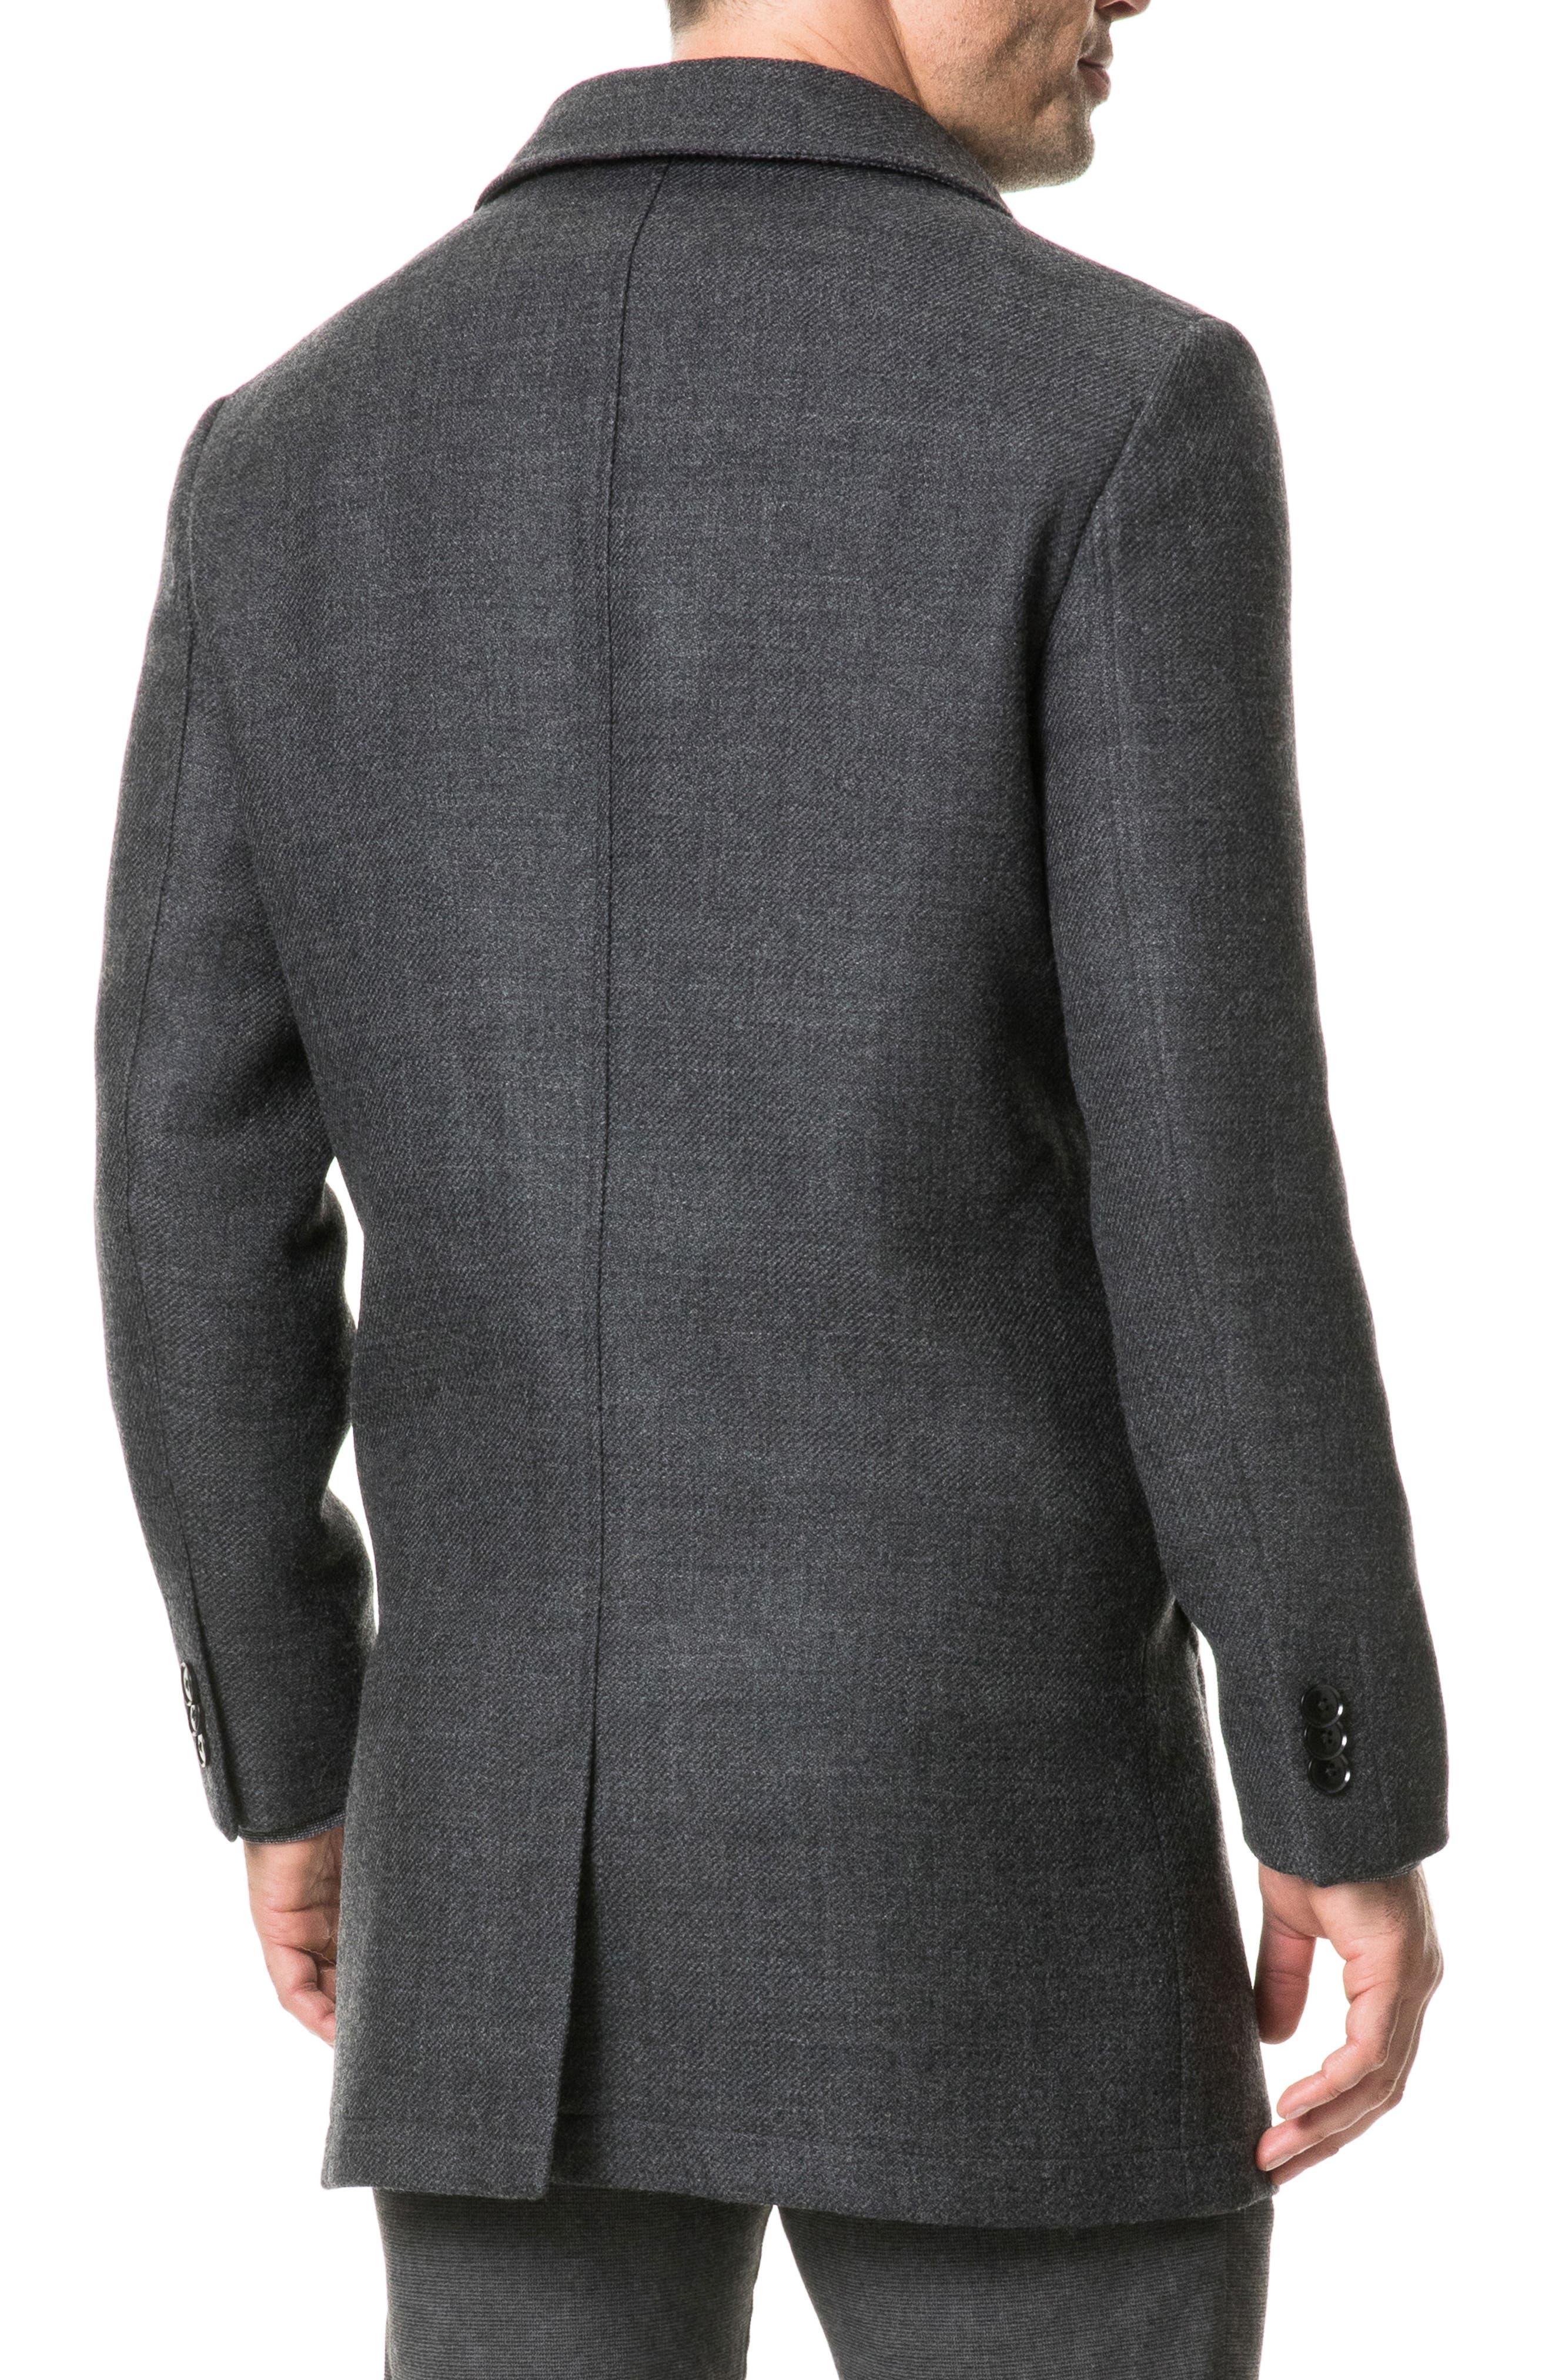 Men's Clothing Shirts Brixton Mens Plaid L/s Button Up Cream M New